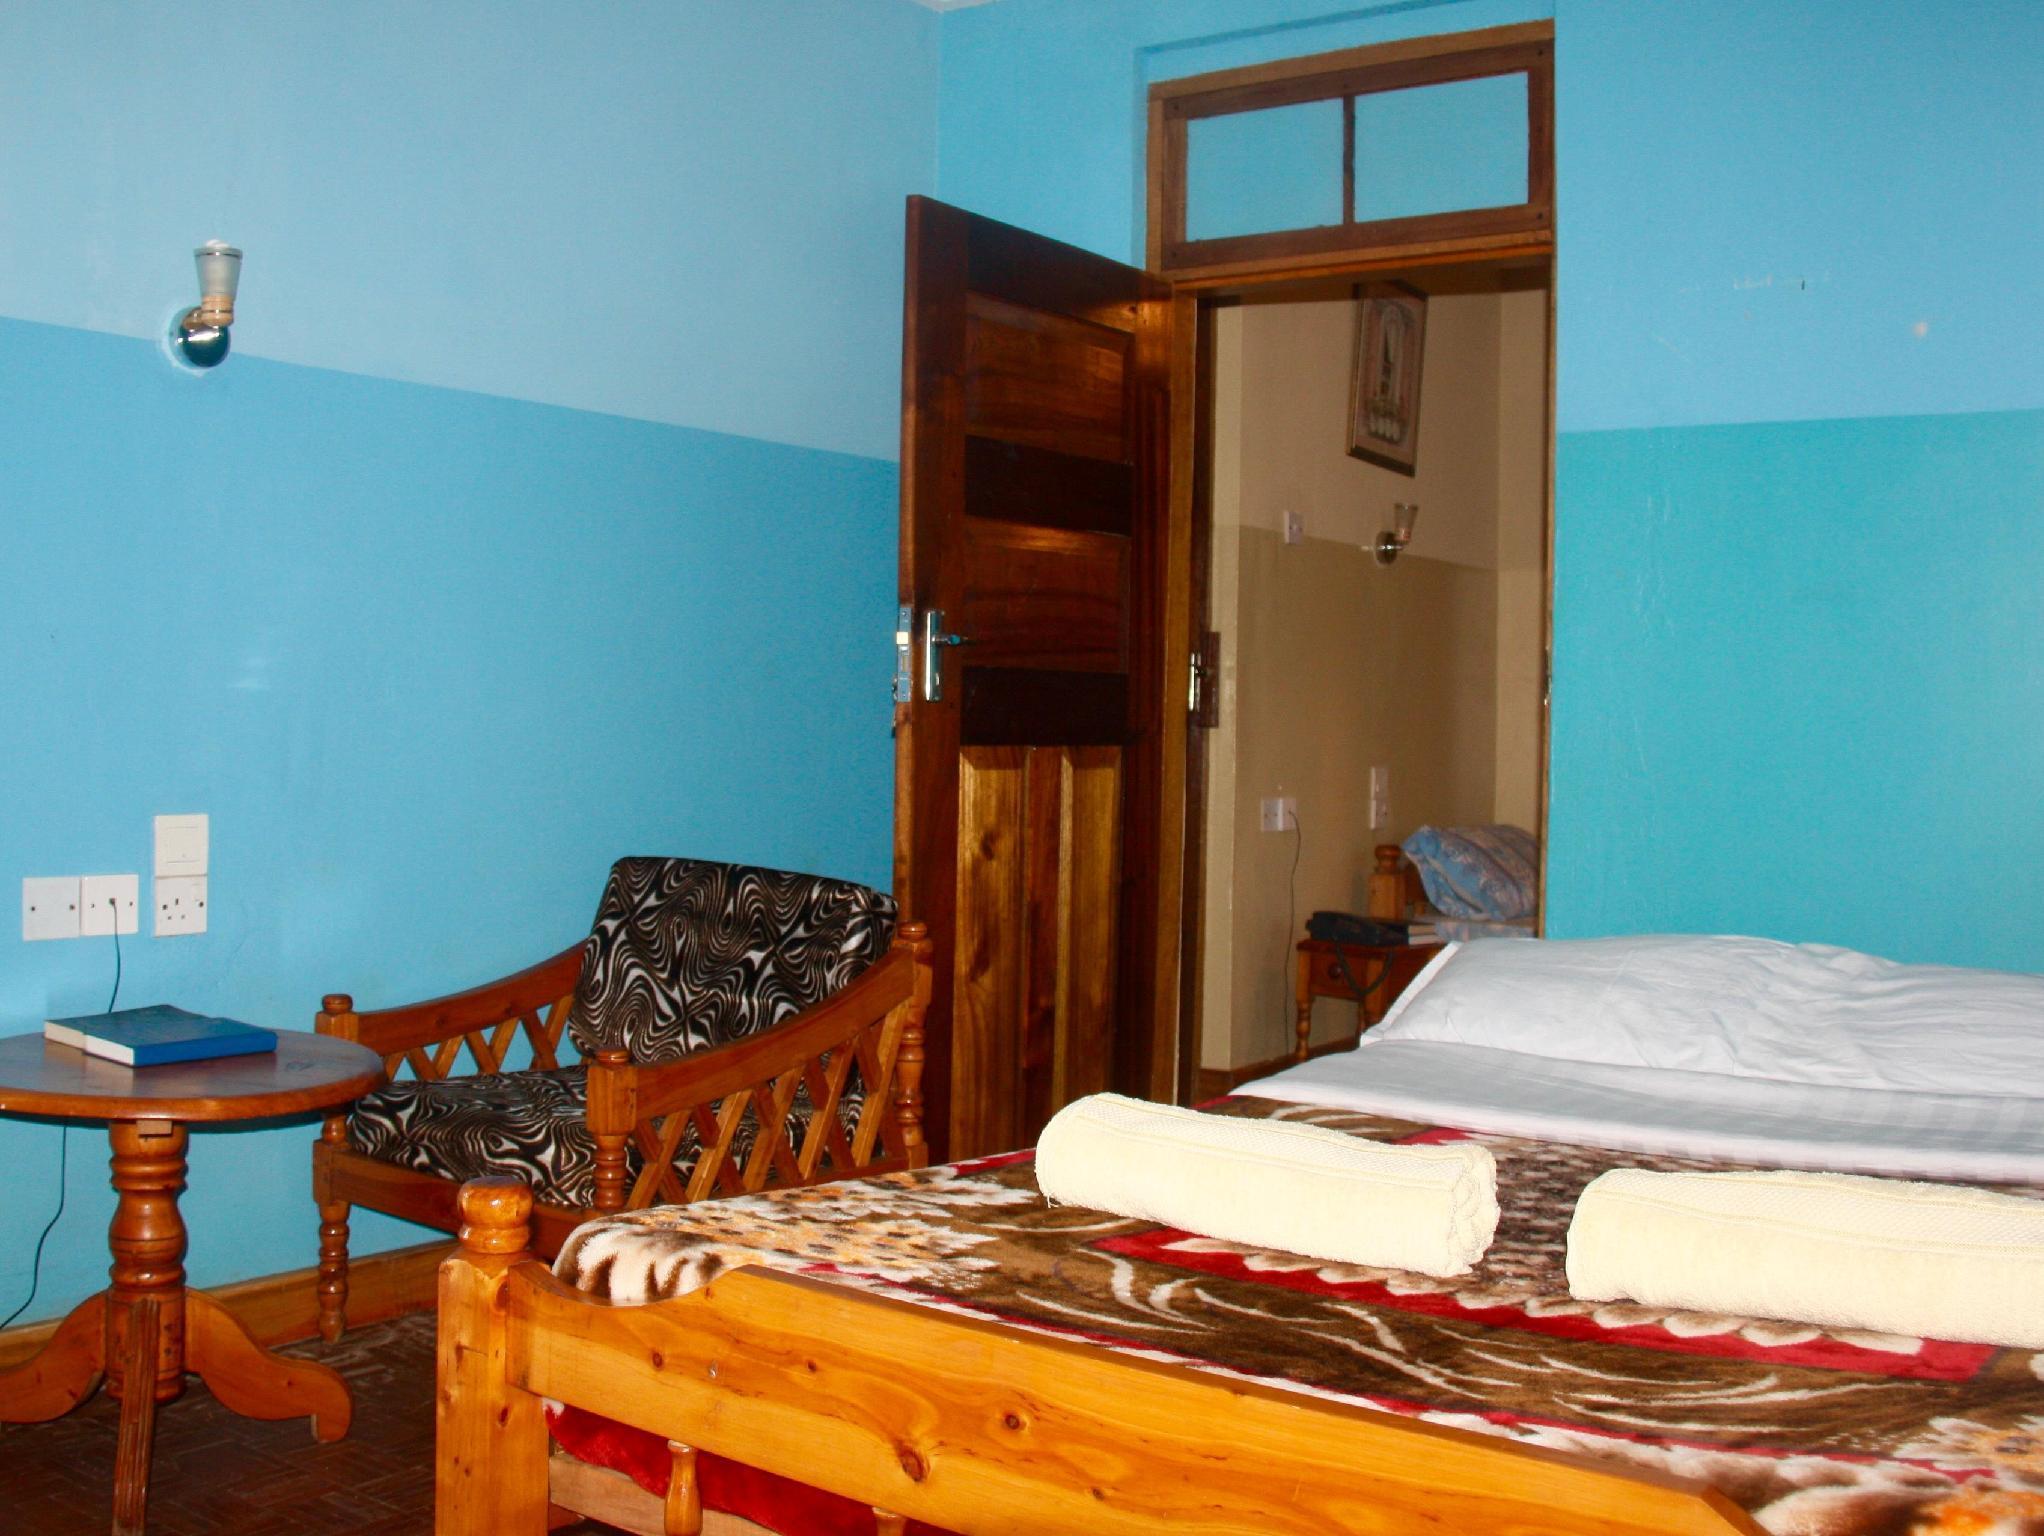 Mkuzu Creek Resort and Camping Site, Lushoto